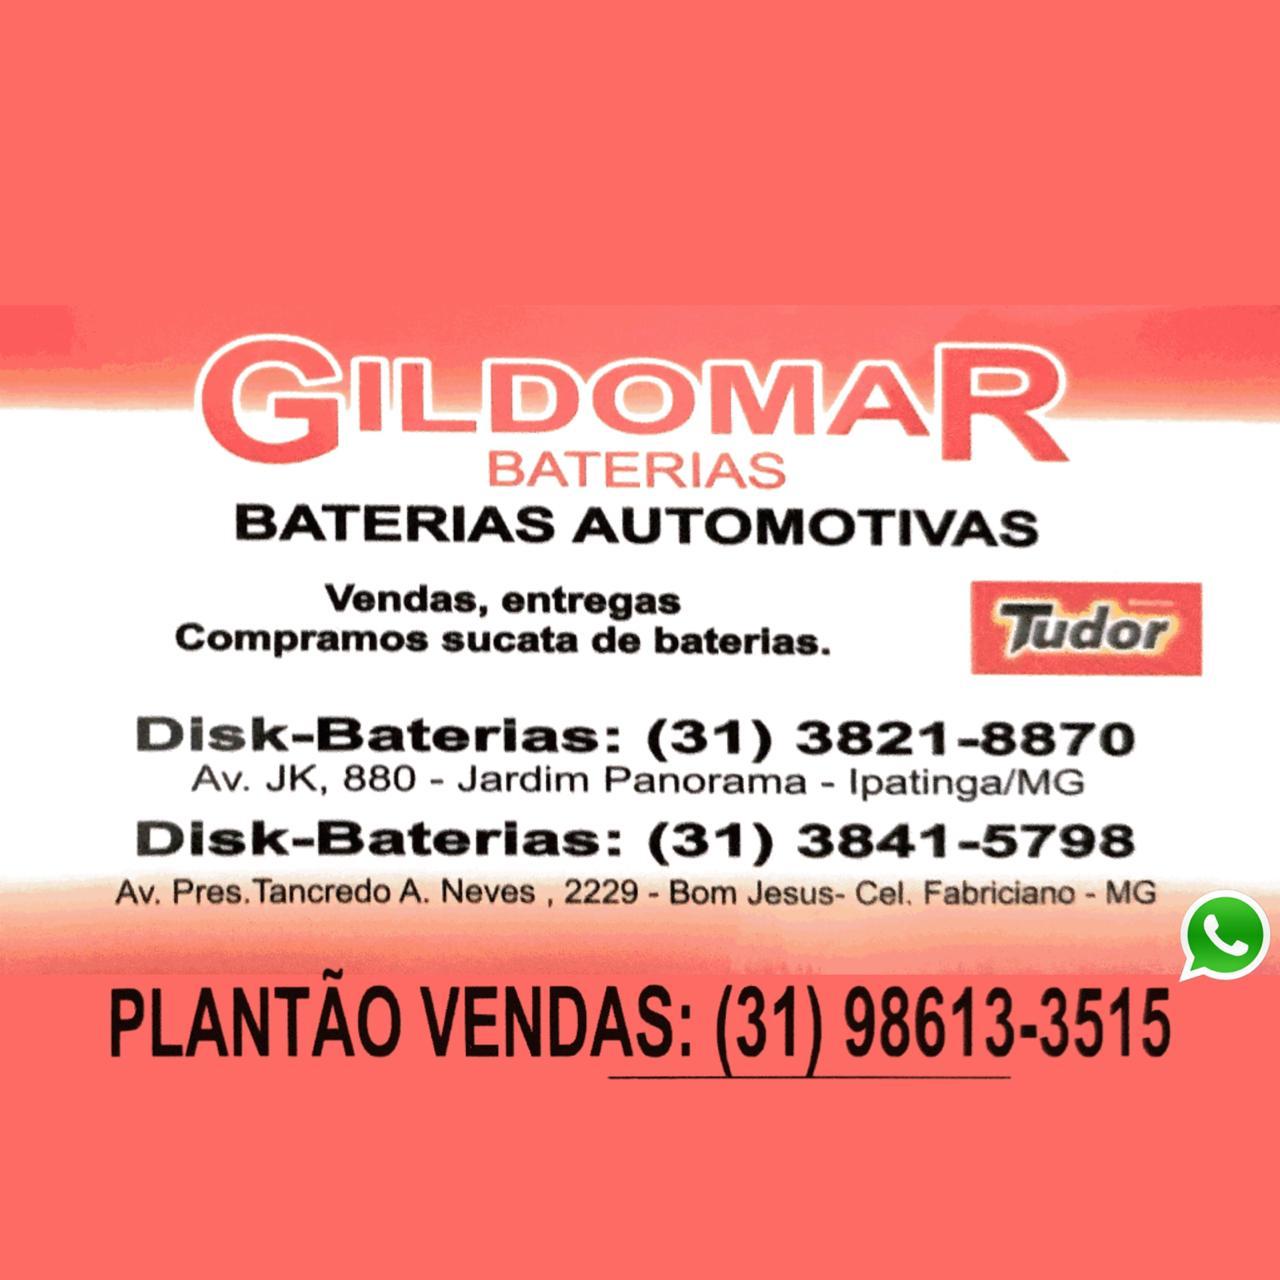 Gildomar Baterias